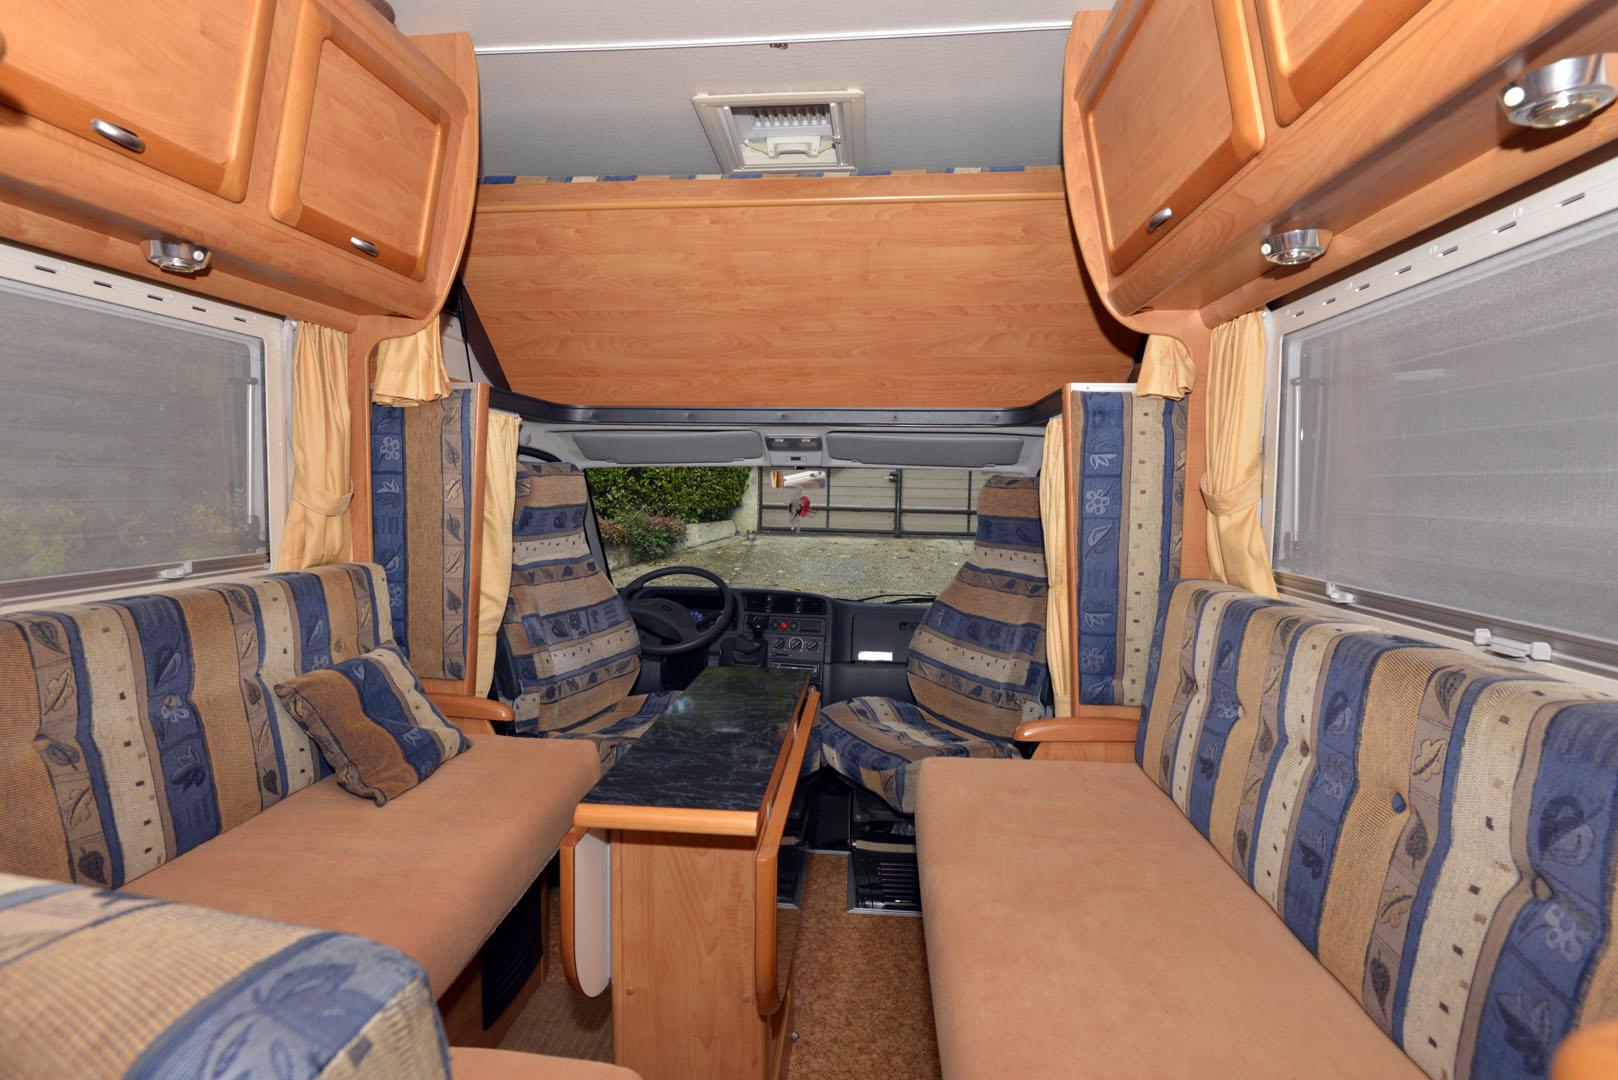 notre camping car islande en camping car. Black Bedroom Furniture Sets. Home Design Ideas